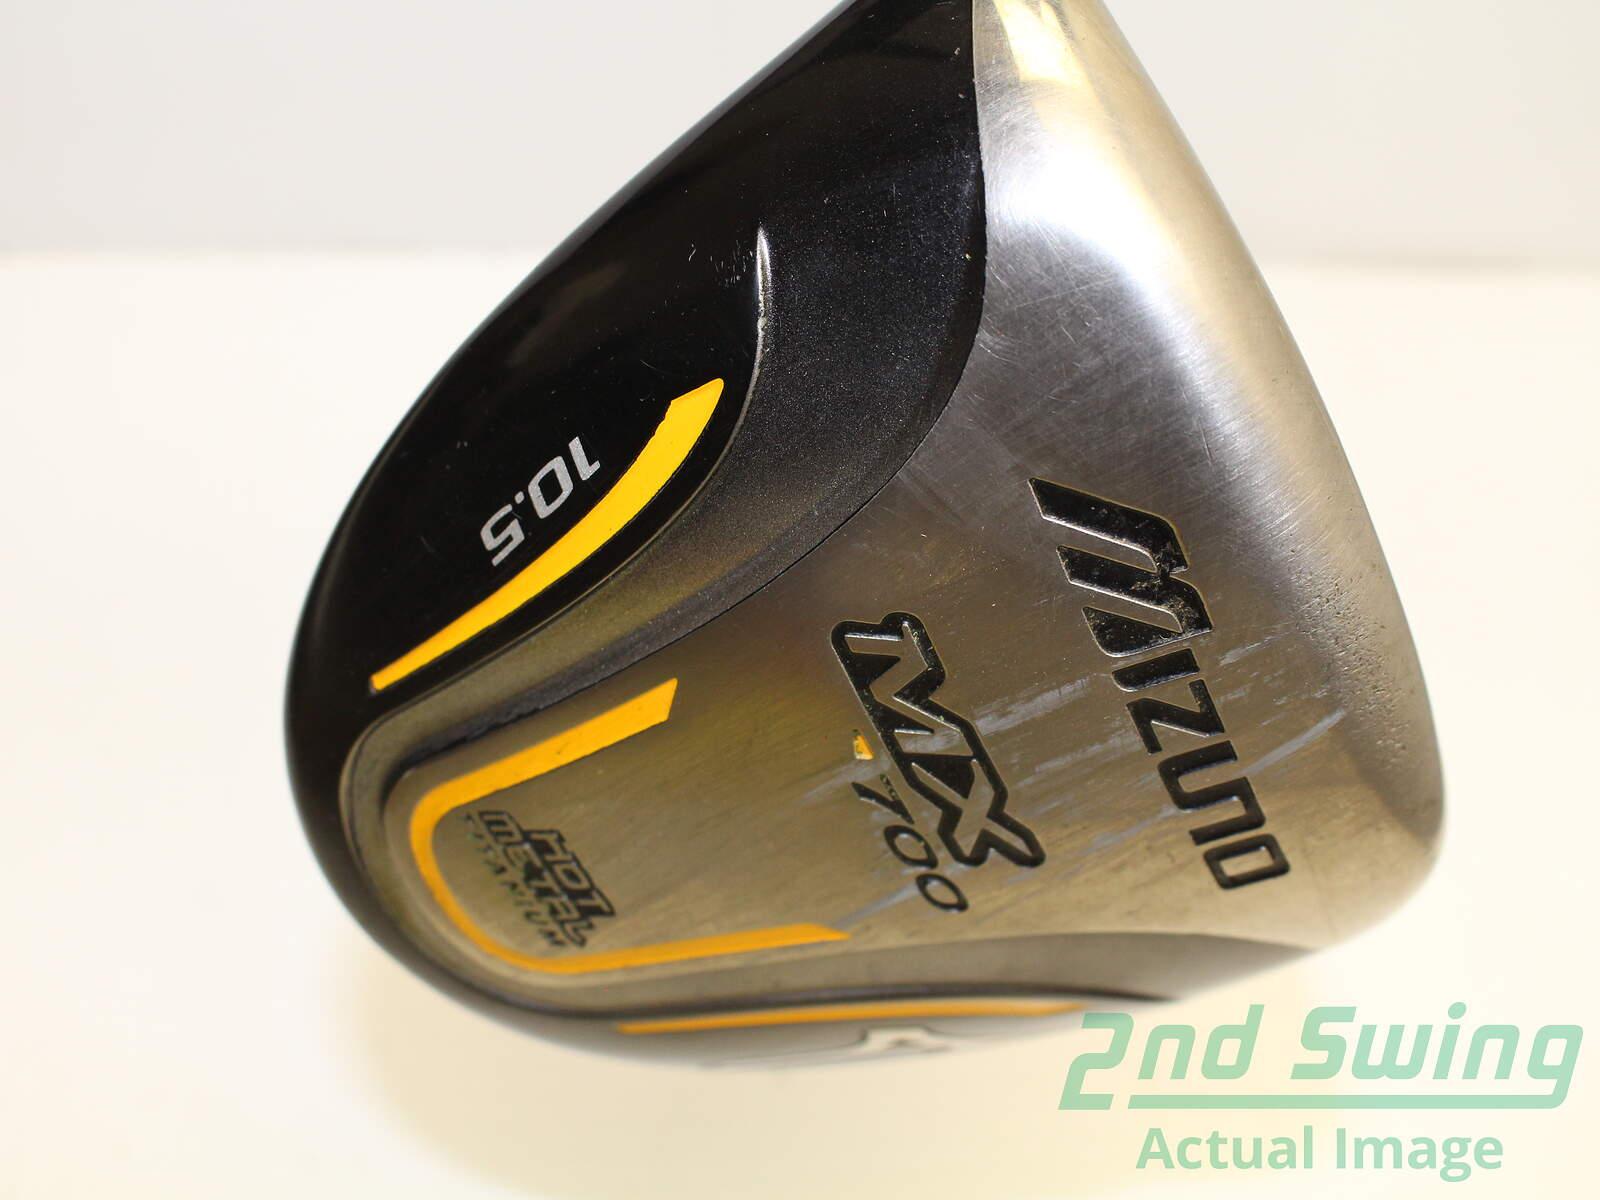 Mizuno mx-700 driver mizuno drivers golfbidder.